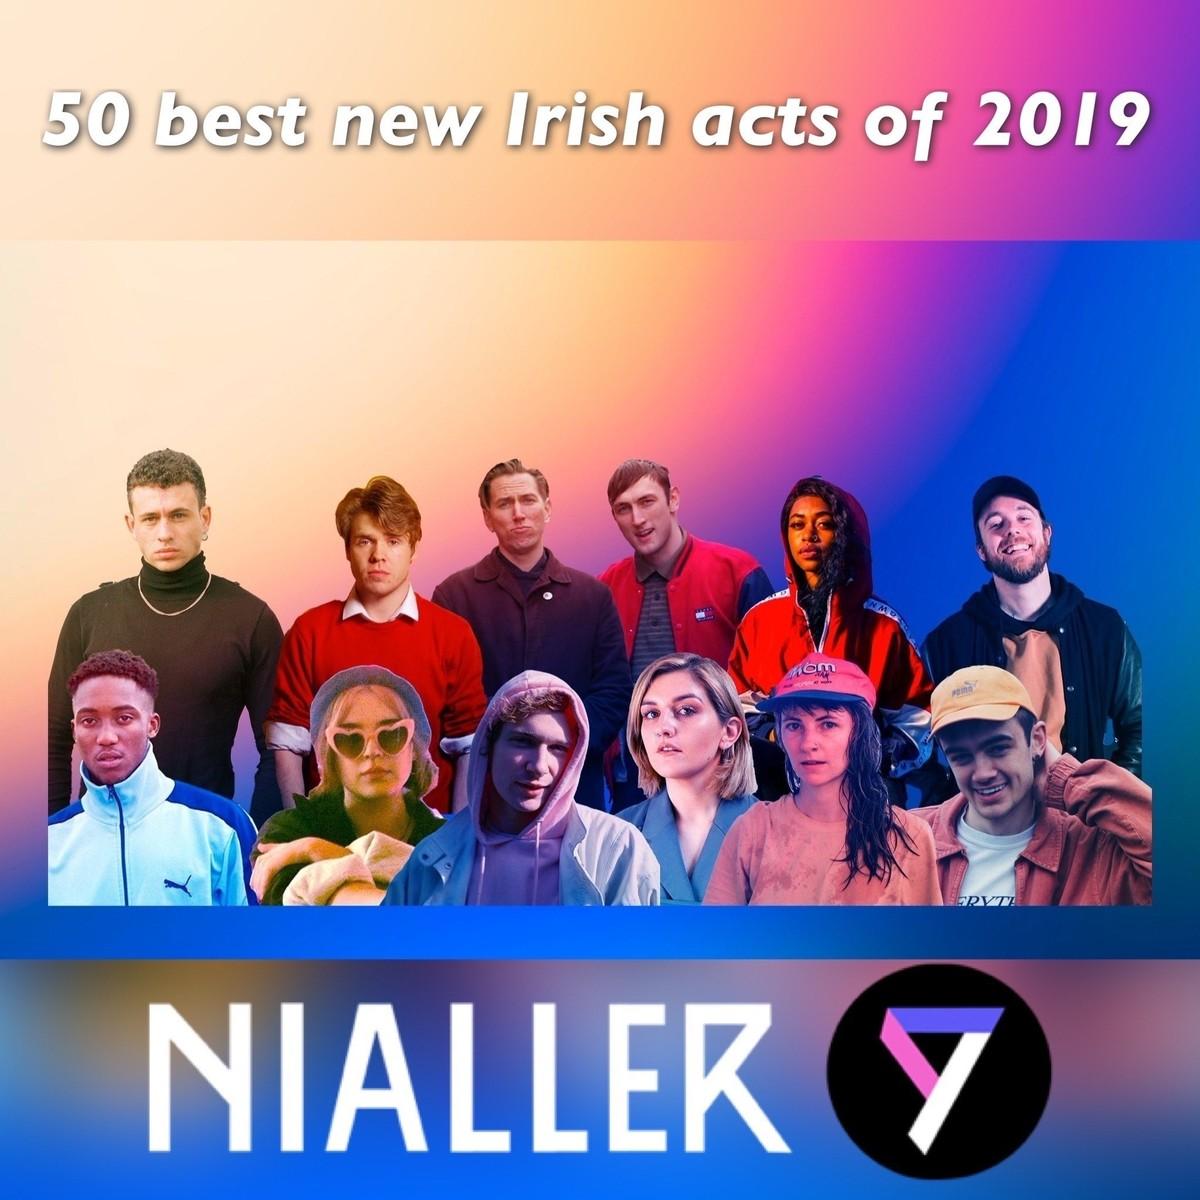 Articlehome nialler 9 50 best new irish acts of 2019